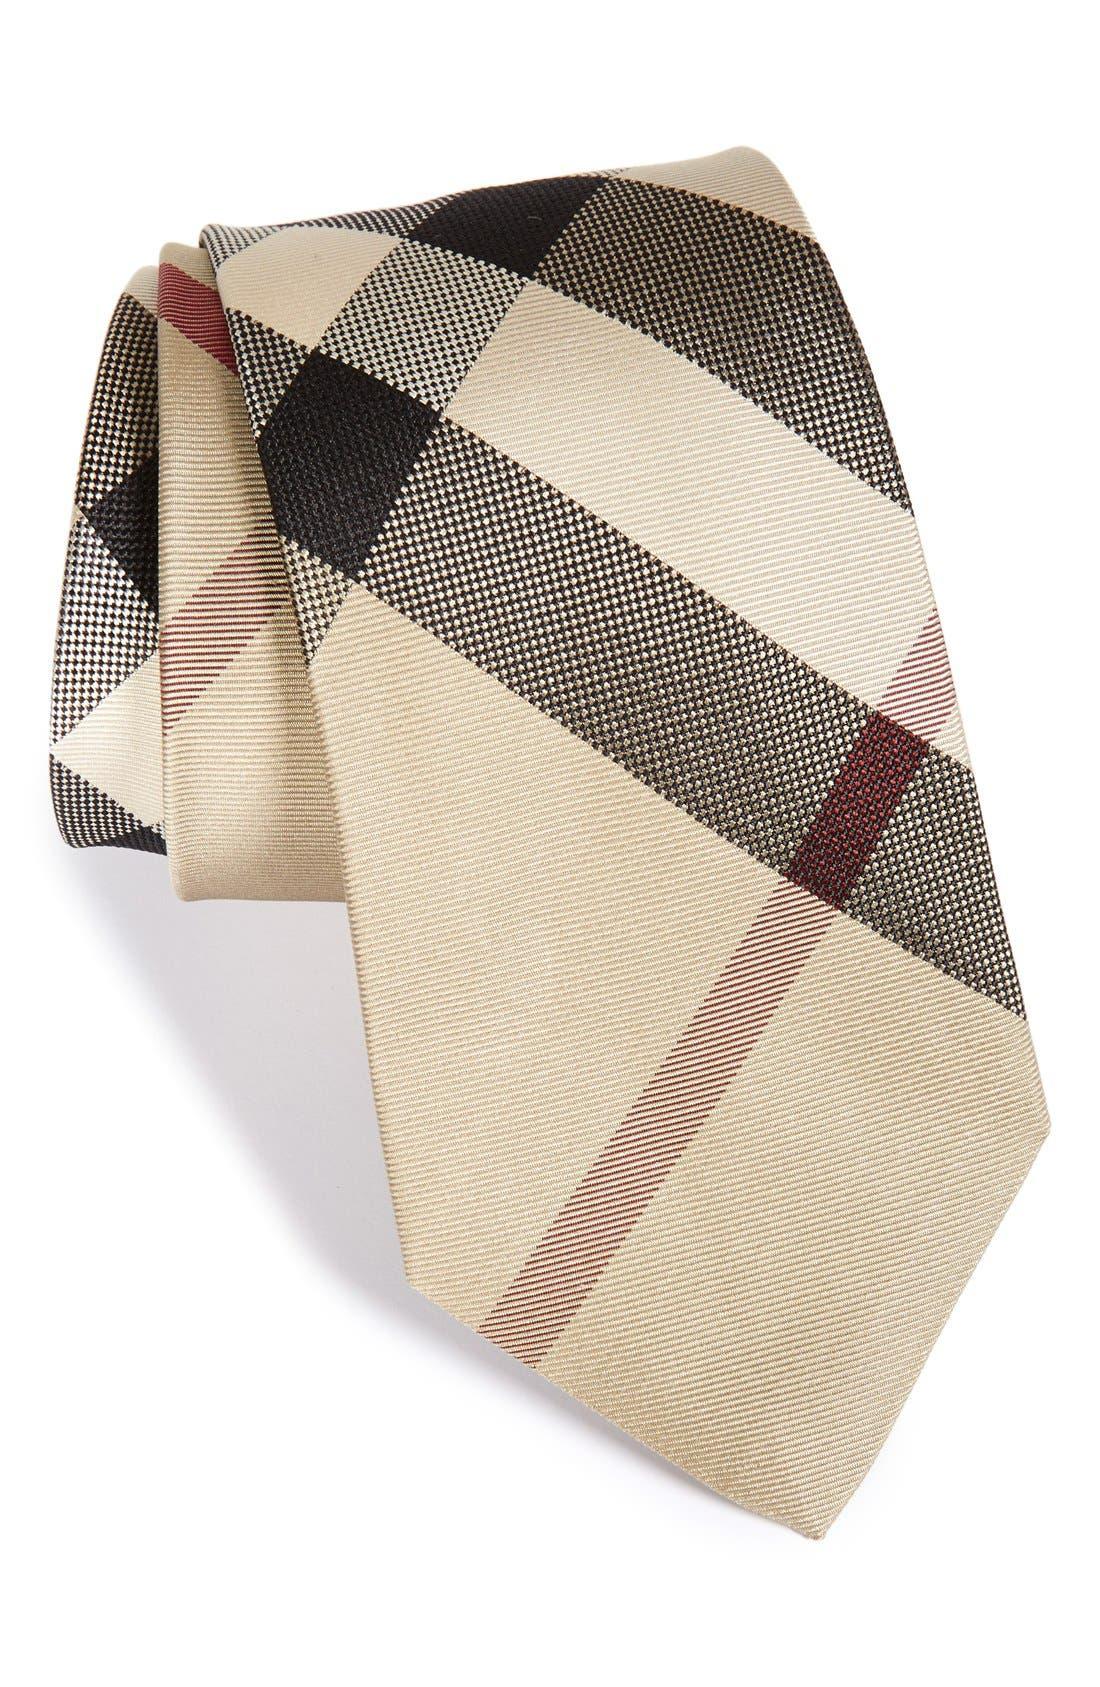 Main Image - Burberry'Manston' Woven Silk Tie